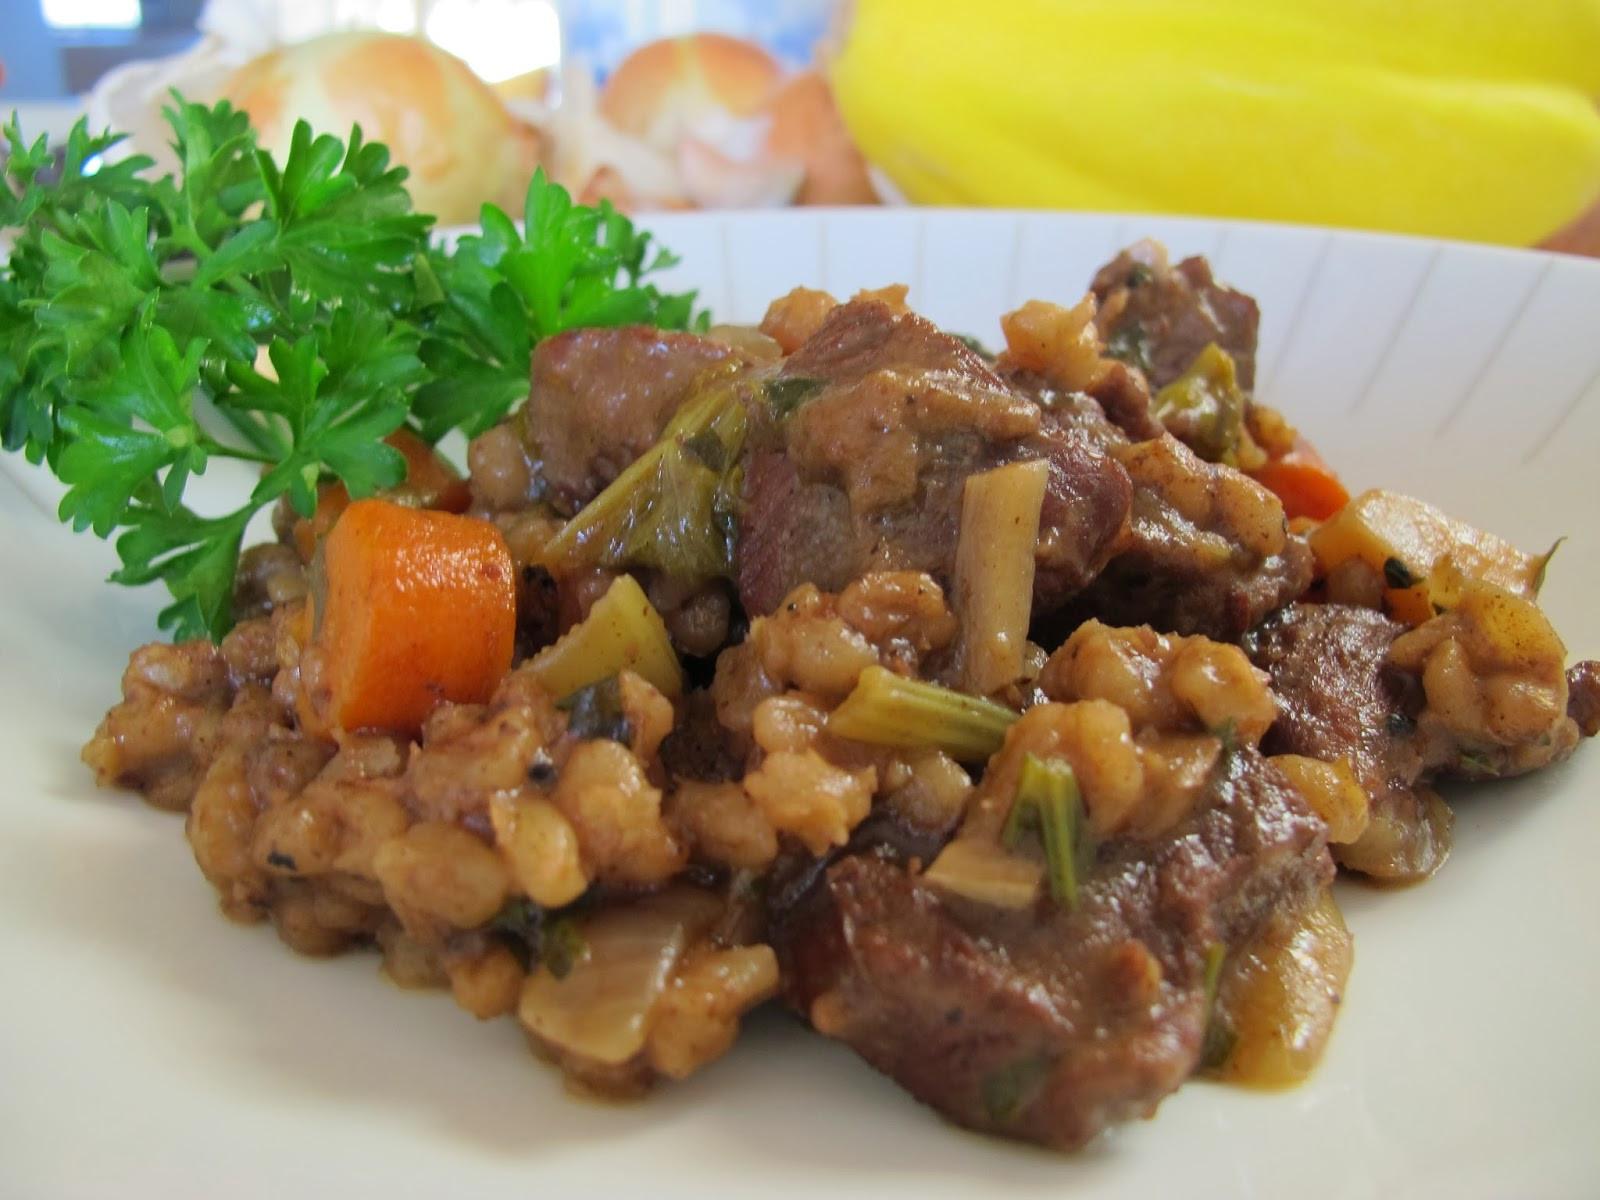 Lamb Barley Stew  MORE TIME AT THE TABLE Lamb and Barley Stew with Root